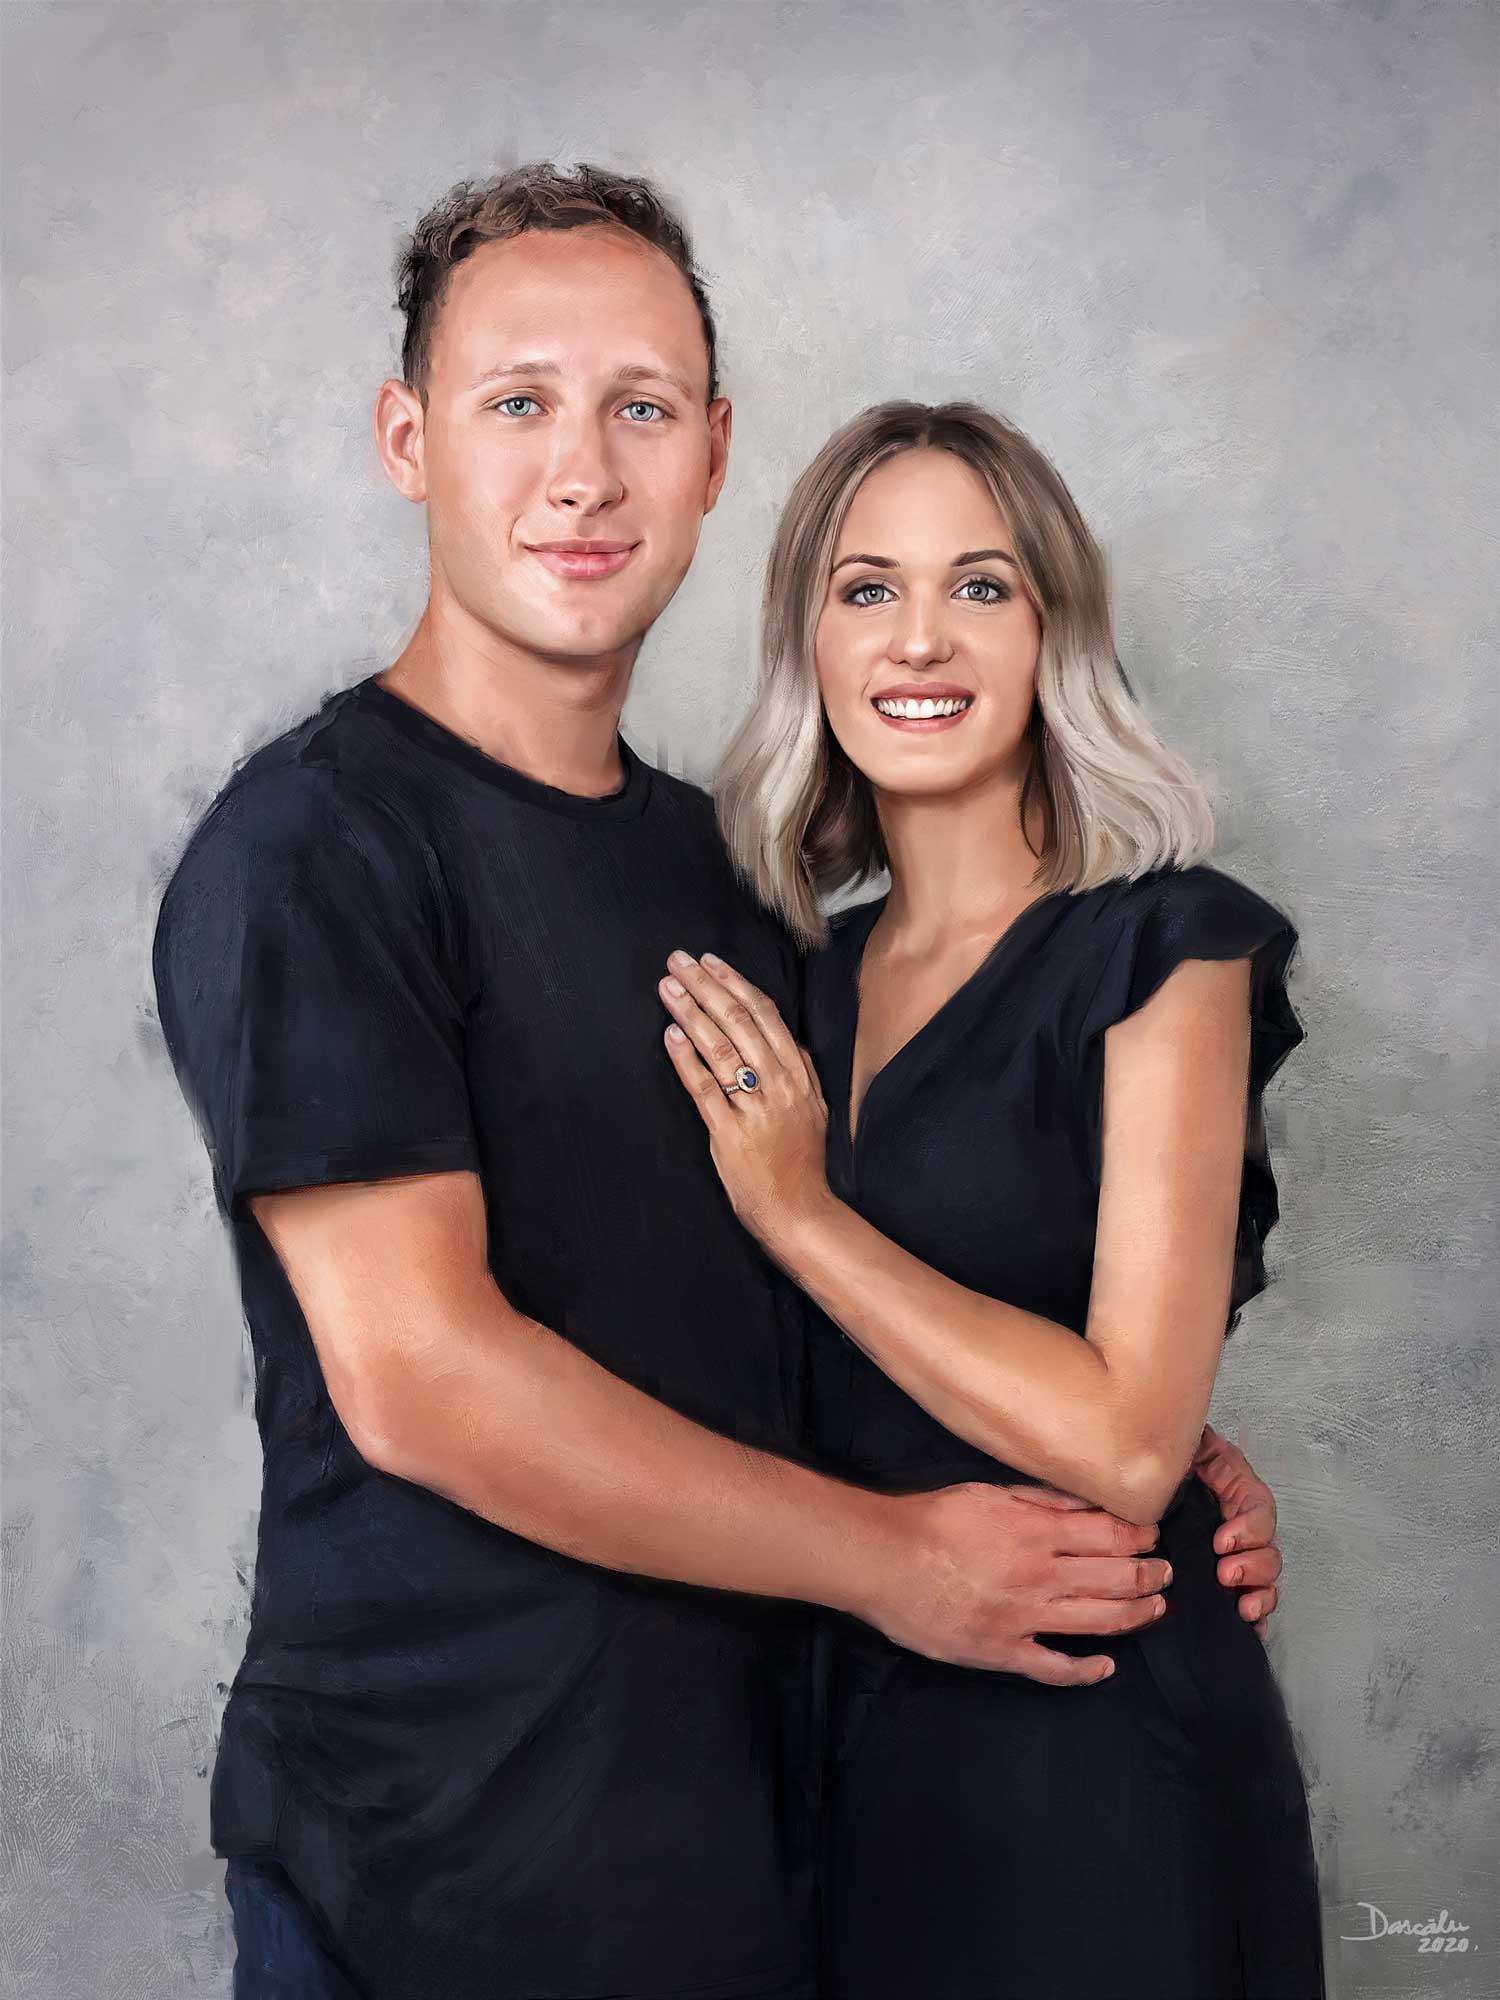 Digital portrait of young couple